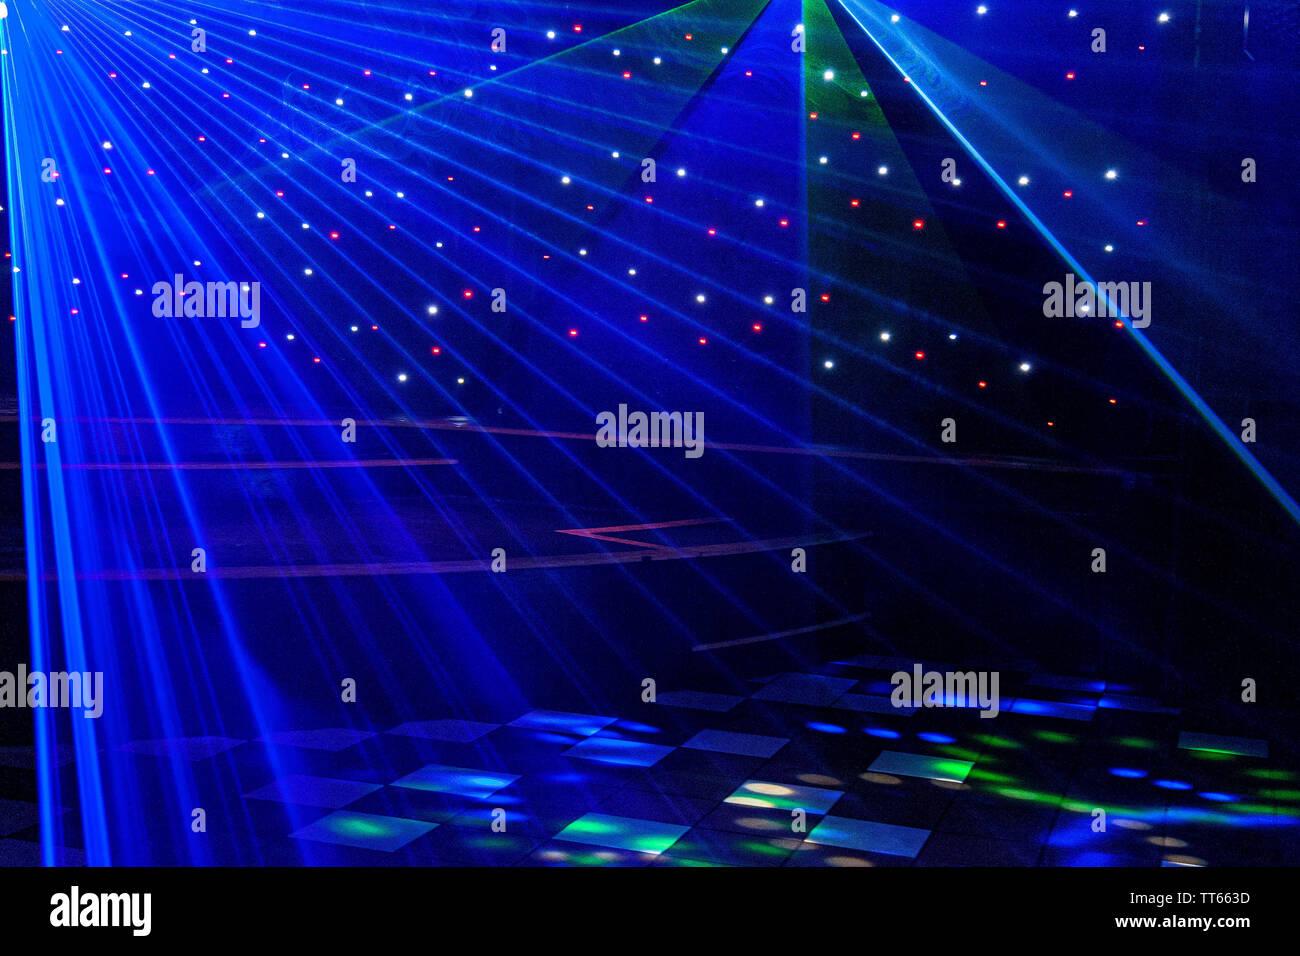 Bright nightclub purple, white, blue laser lights cutting through smoke machine smoke making light and rainbow patterns on the dance floor. Laser ligh - Stock Image